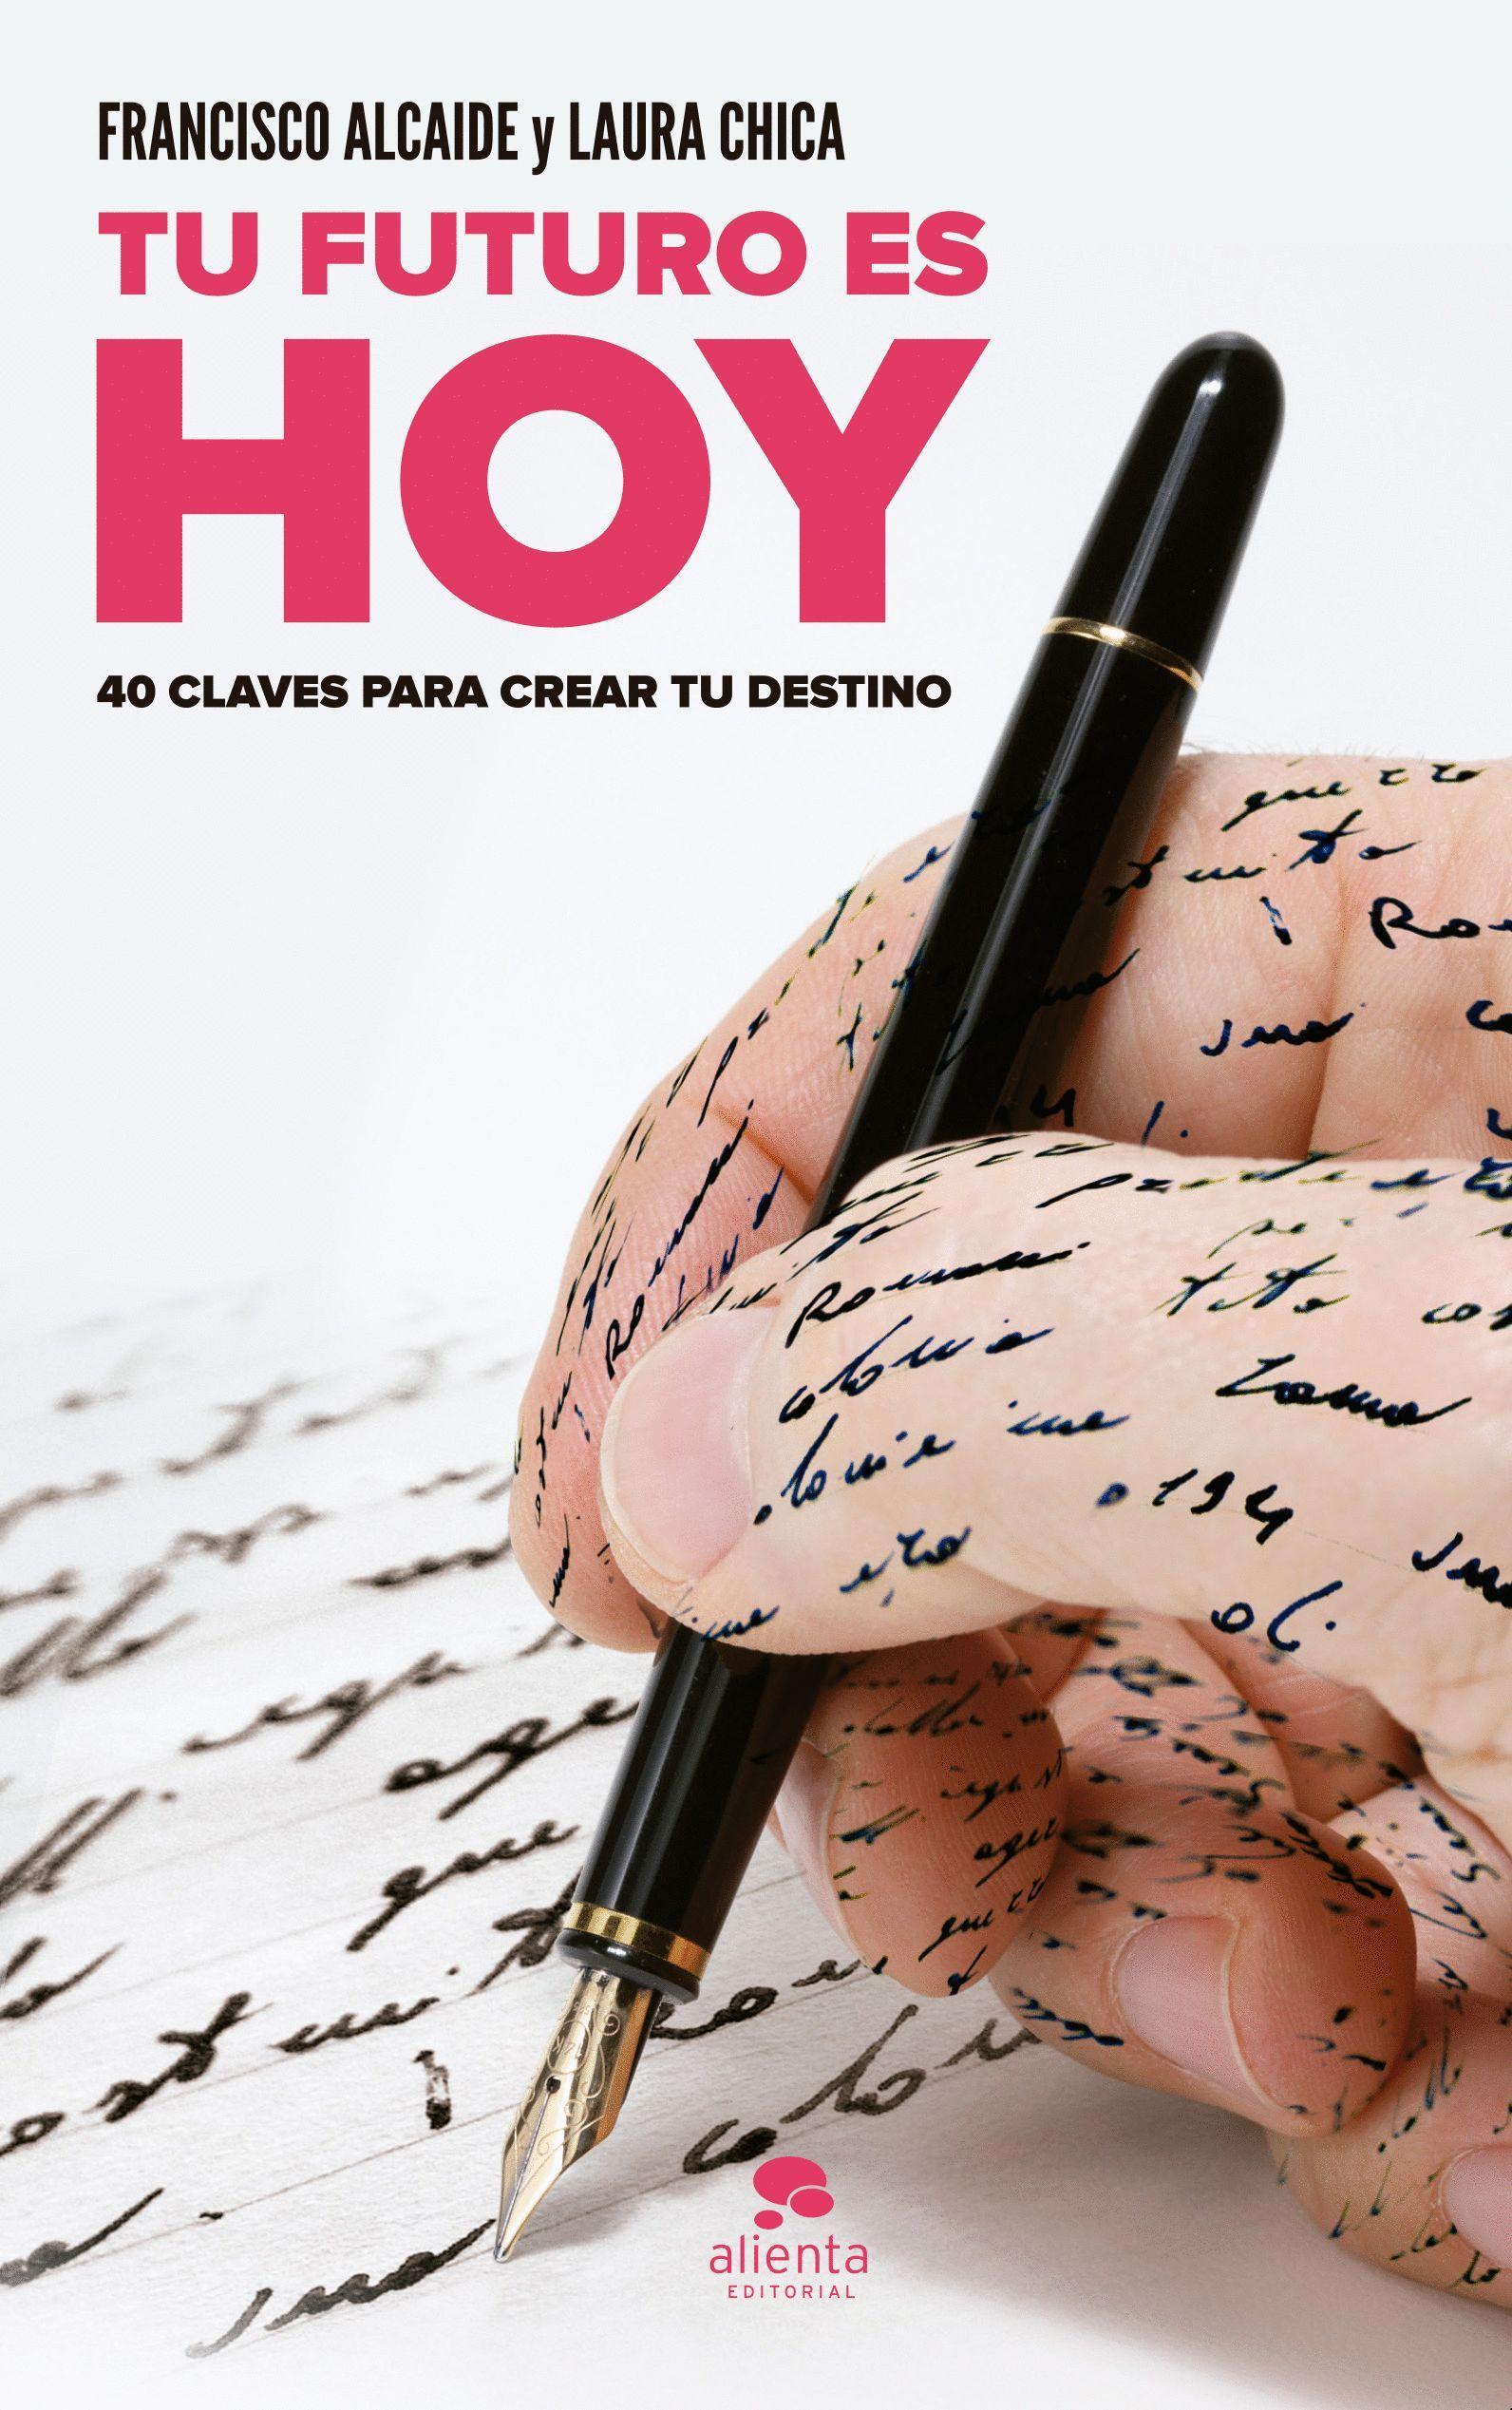 TU FUTURO ES HOY